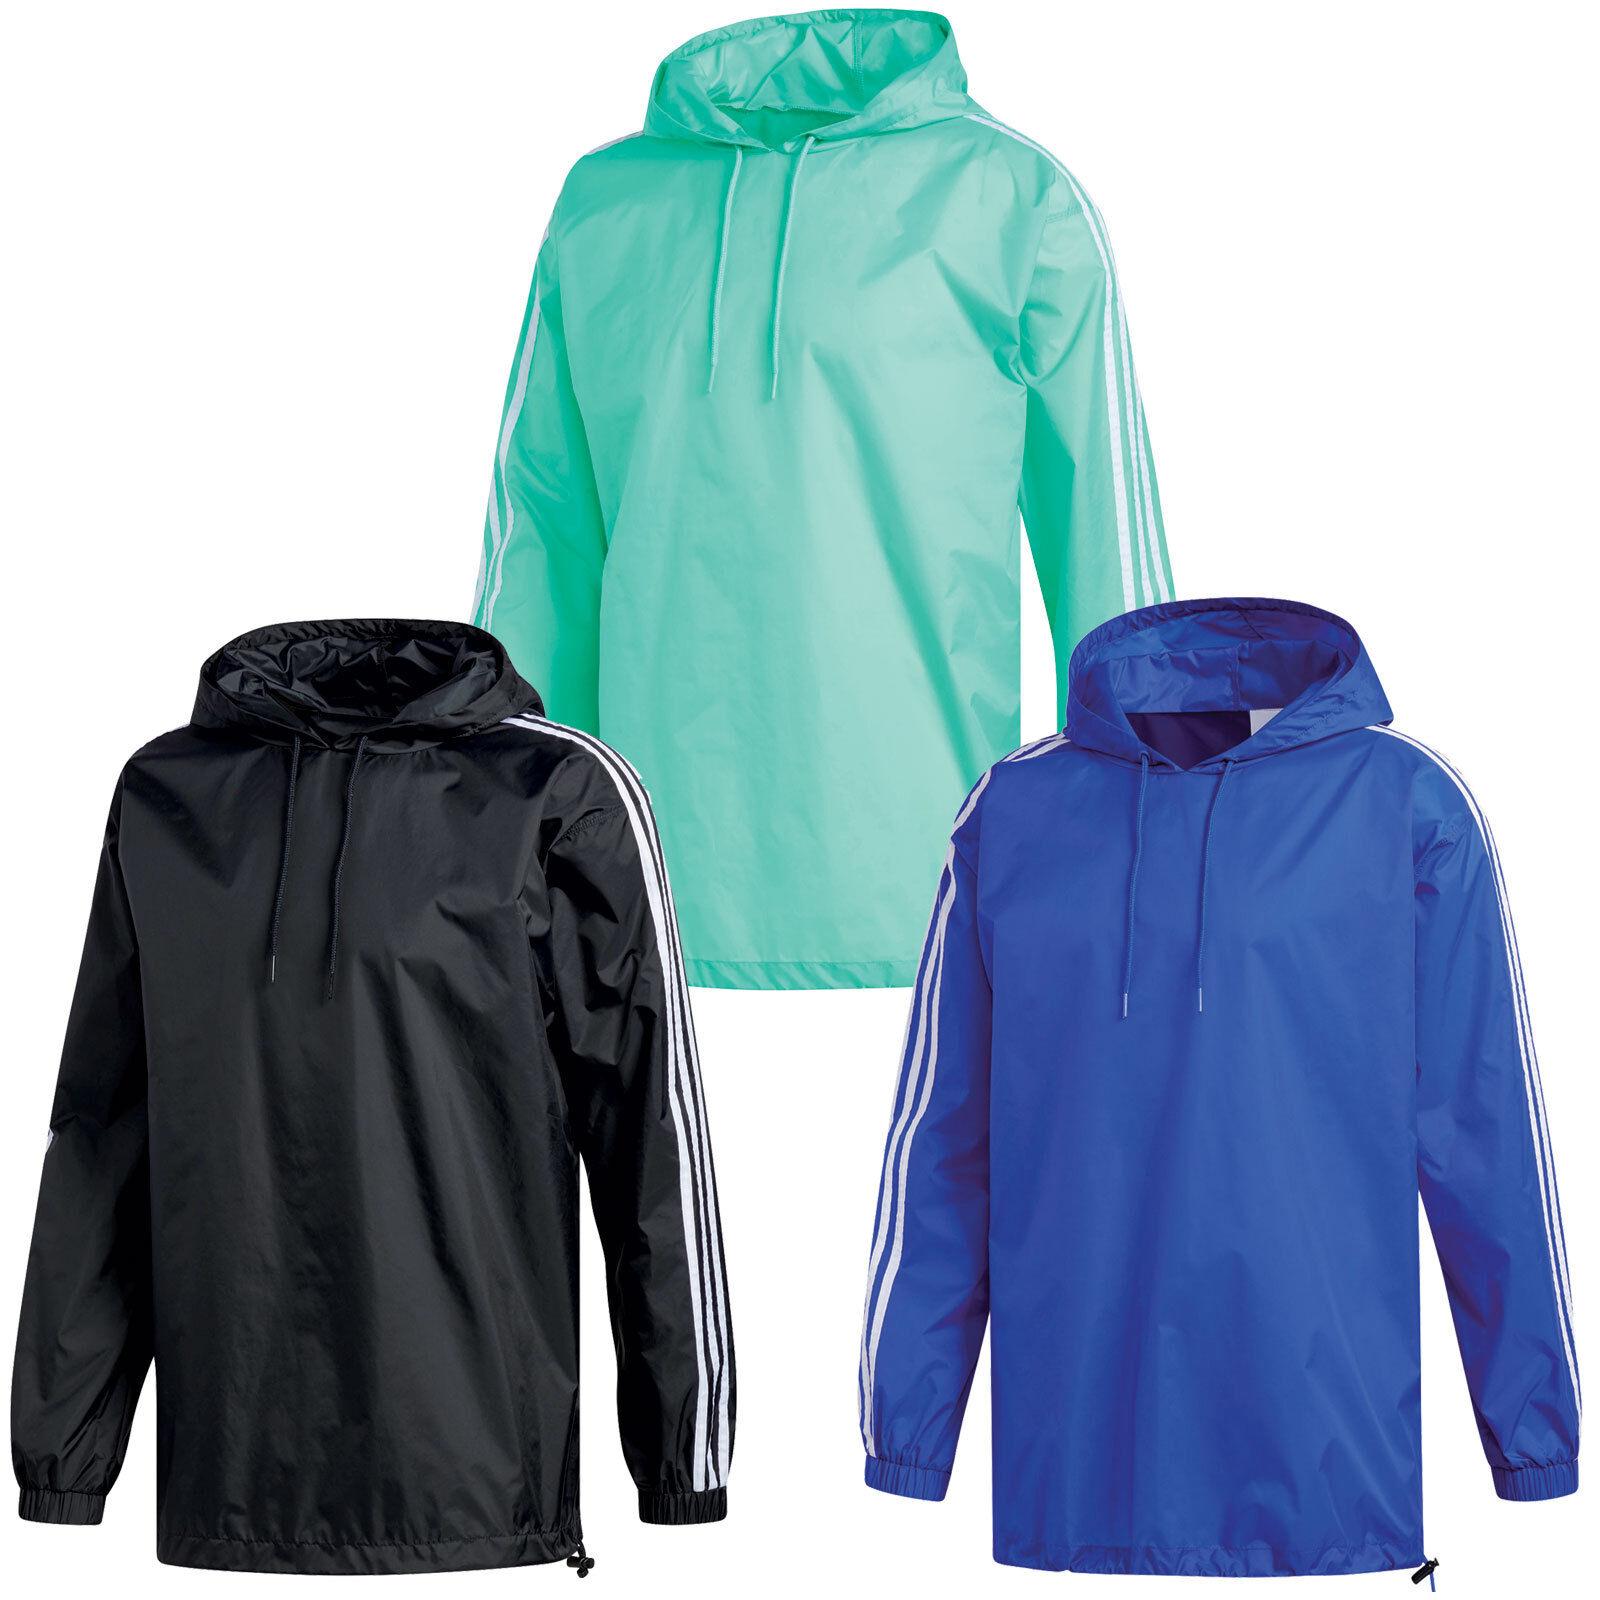 Adidas Originals Poncho Windbreaker Men's Transitional Jacke